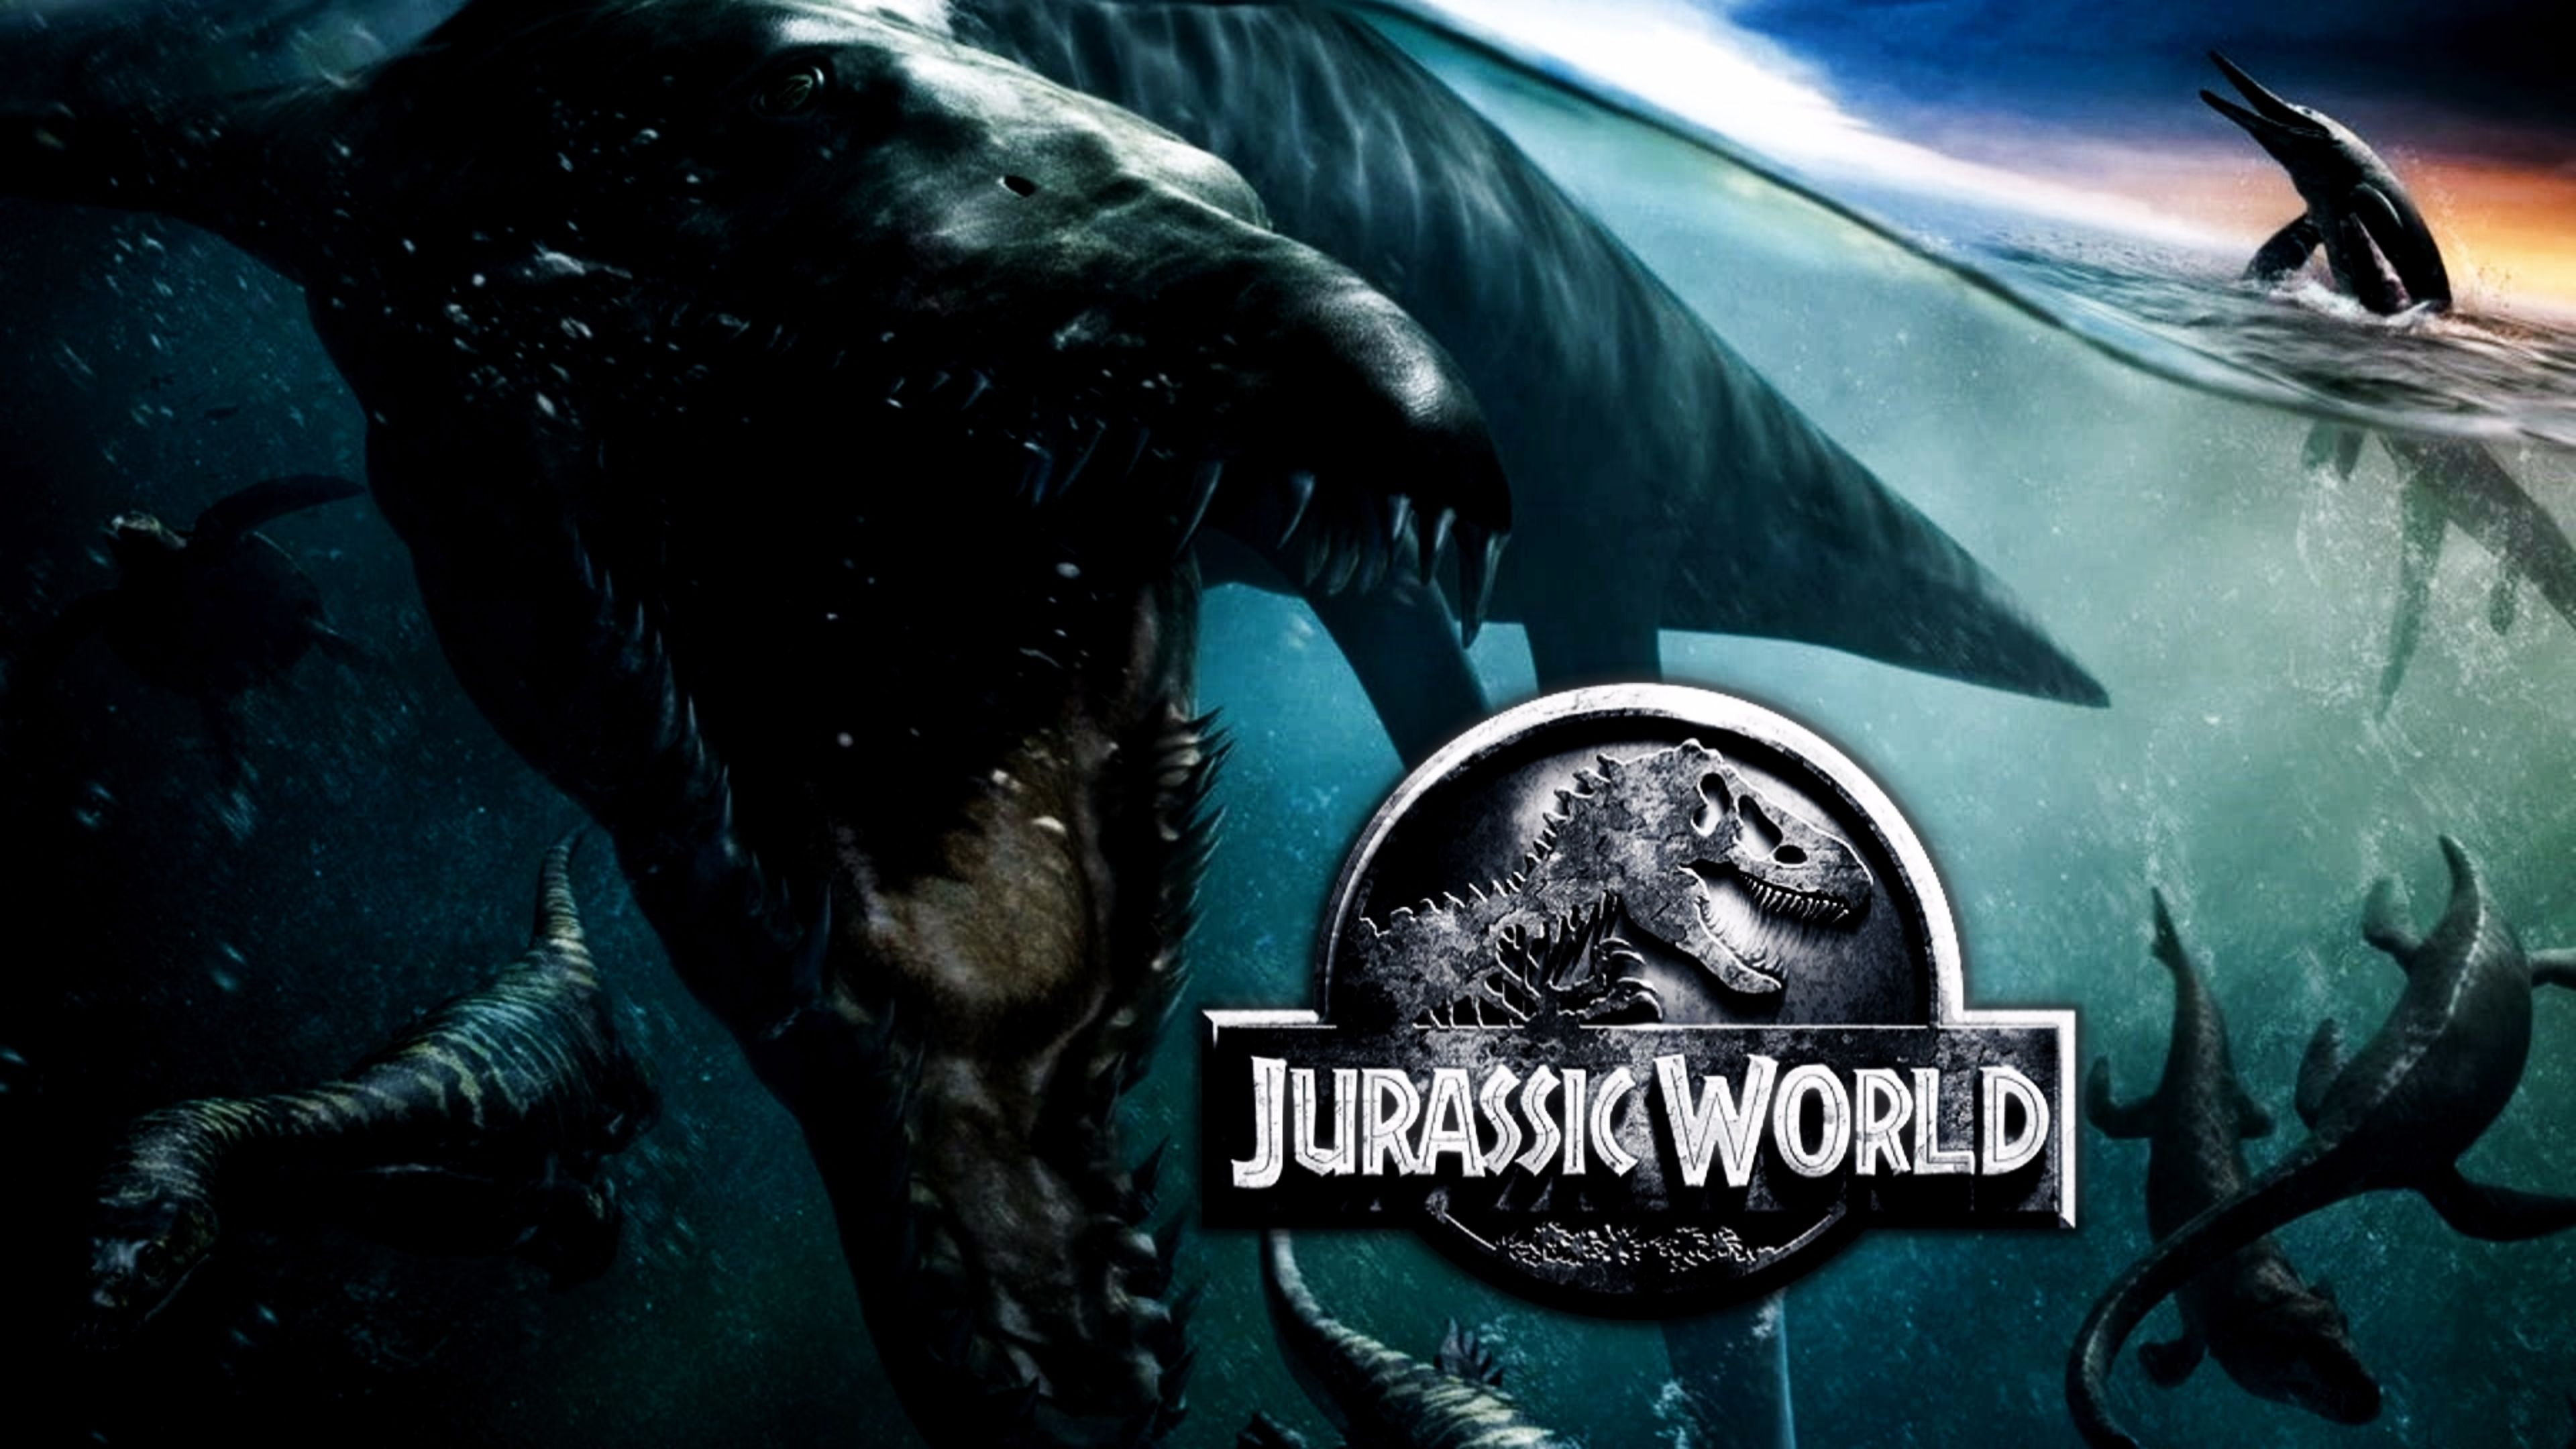 Jurassic World 4k Wallpaper